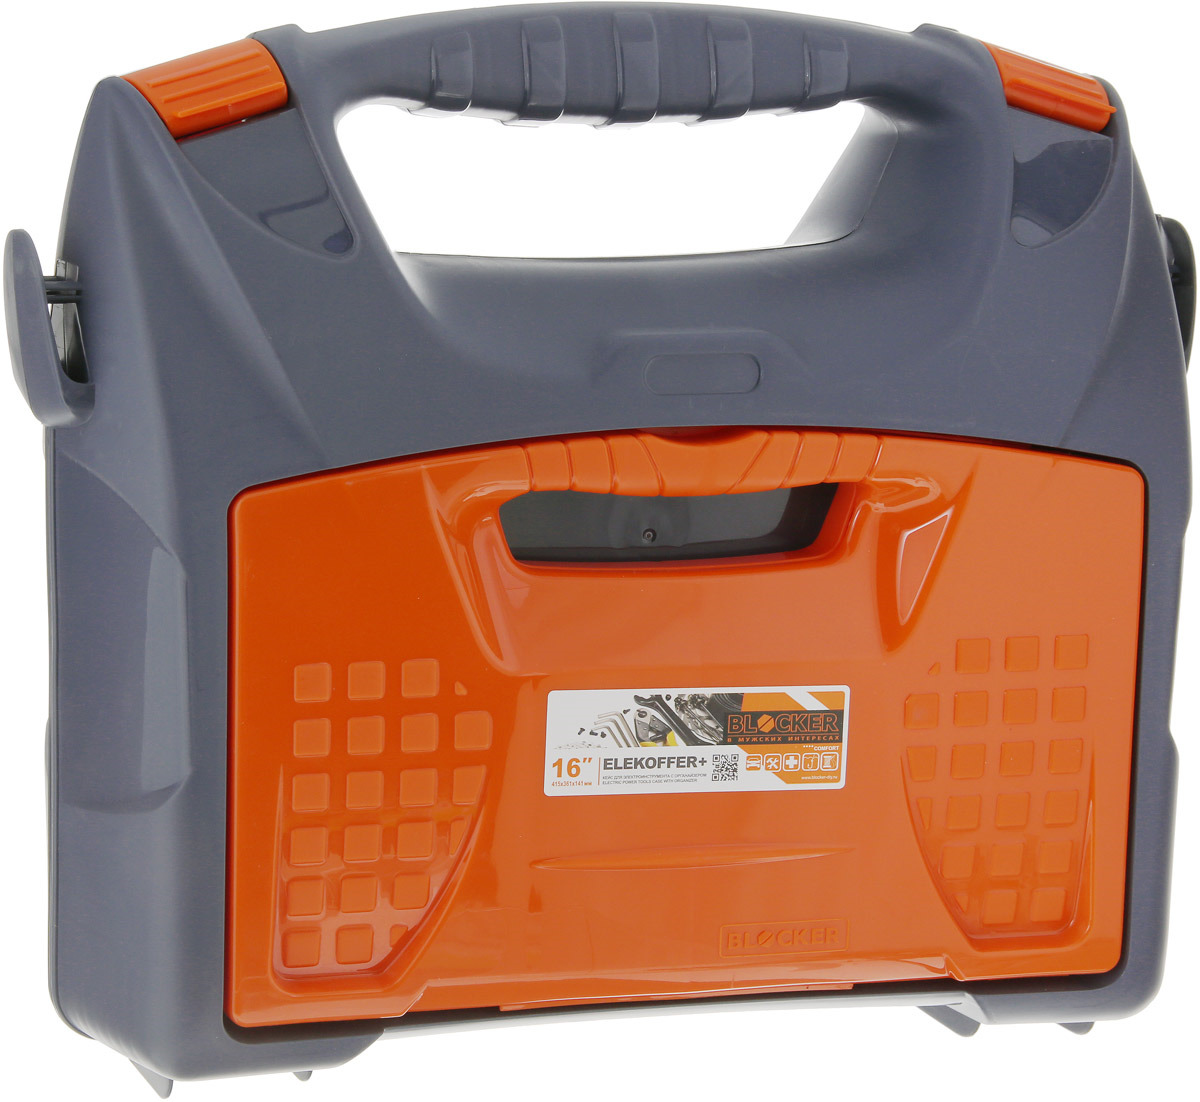 Кейс для электроинструмента Blocker Elekoffer +, с органайзером, цвет: серый, оранжевый, 415 х 361 х 141 мм